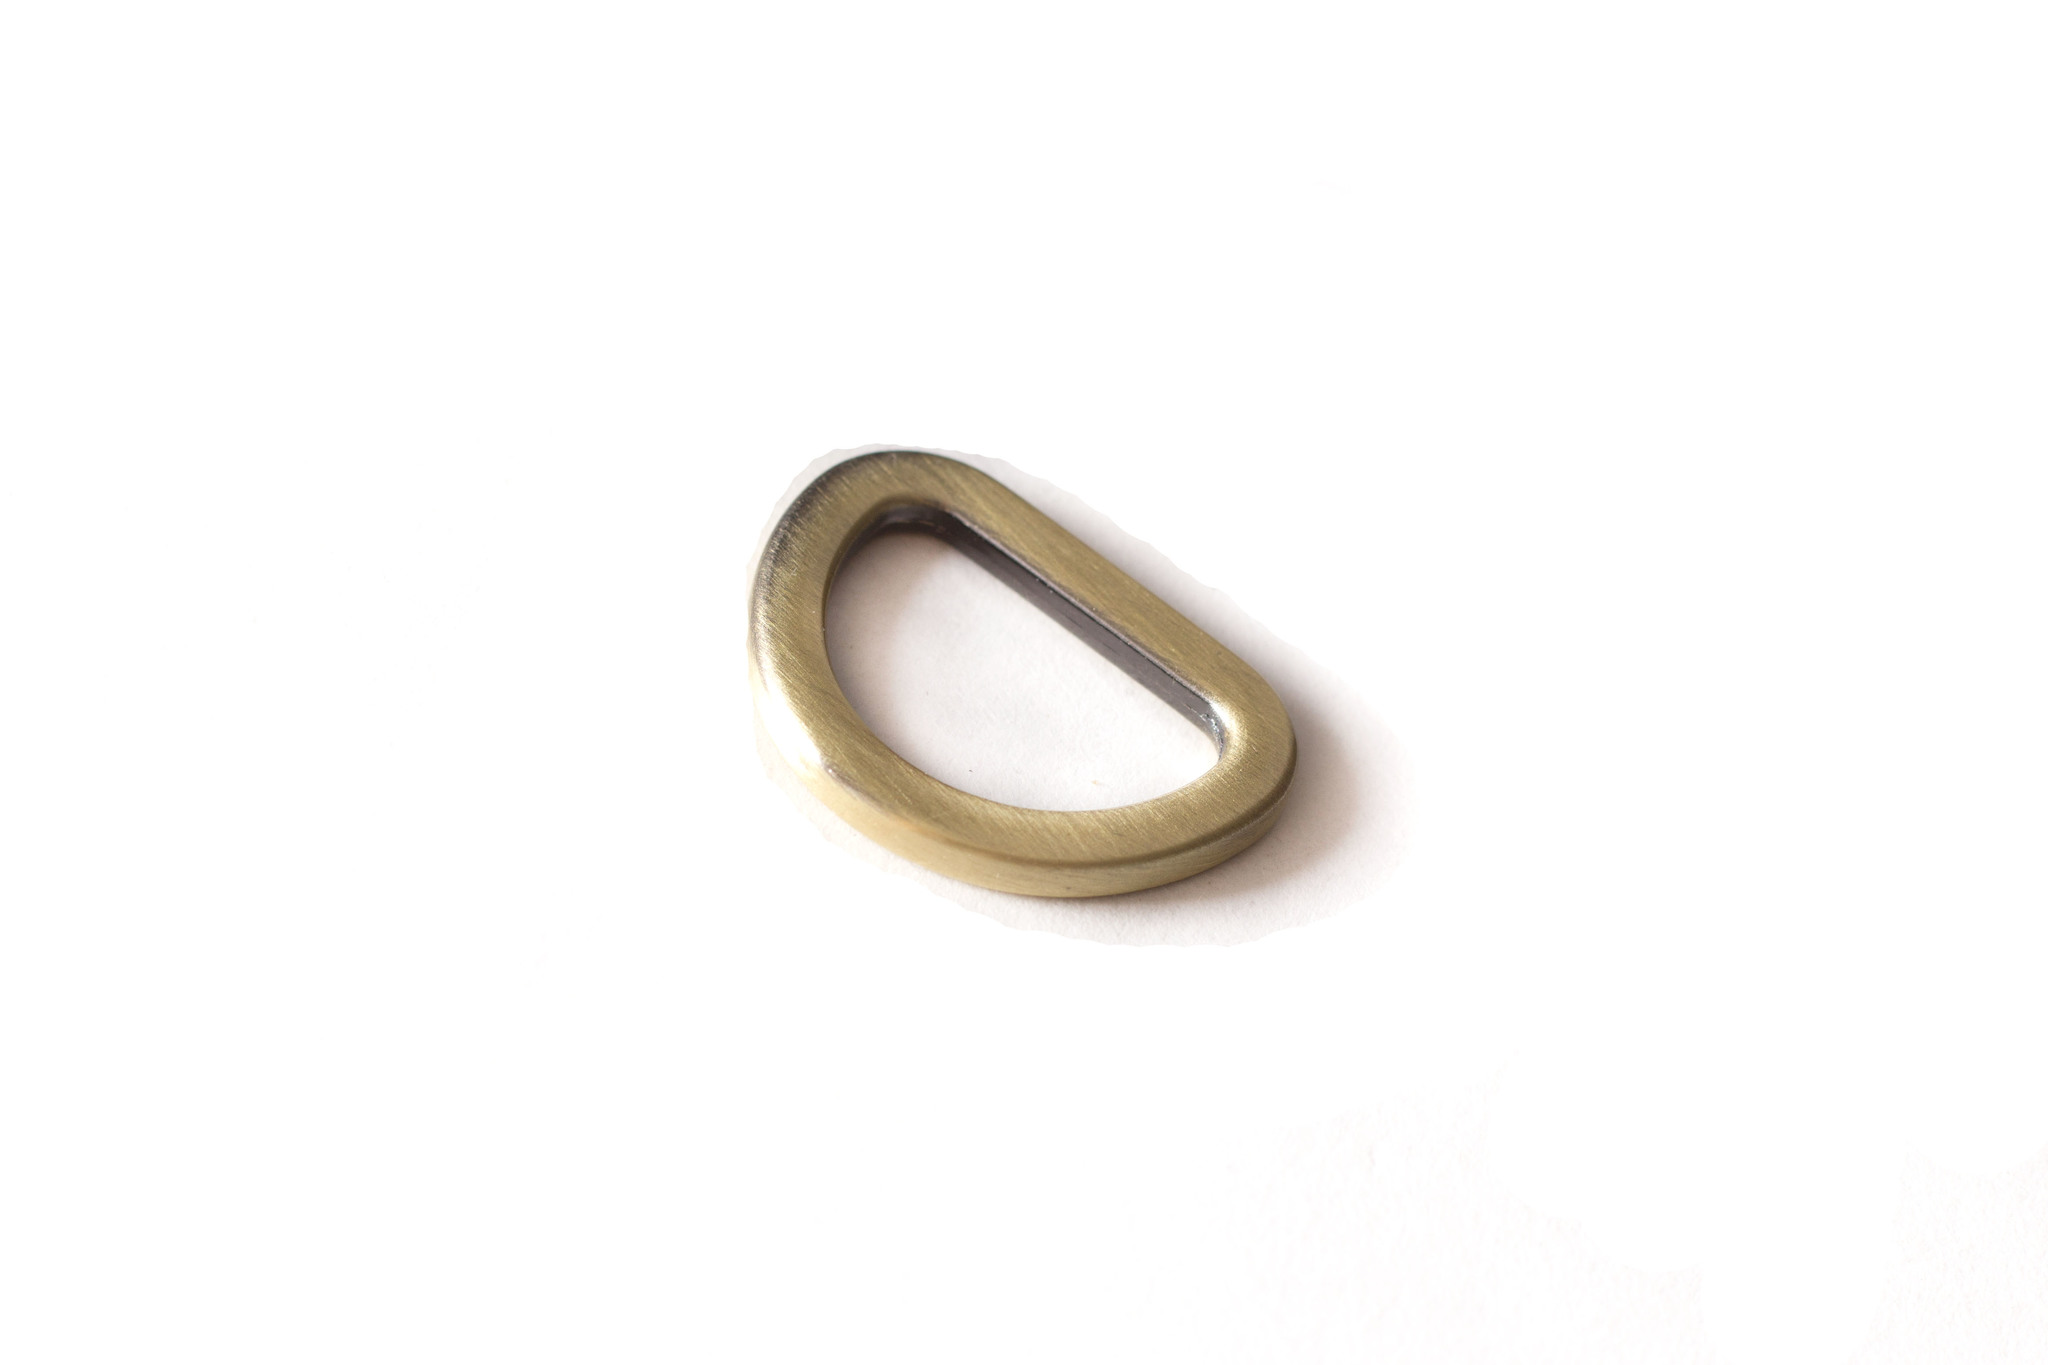 Полукольцо 20х13 мм, латунь